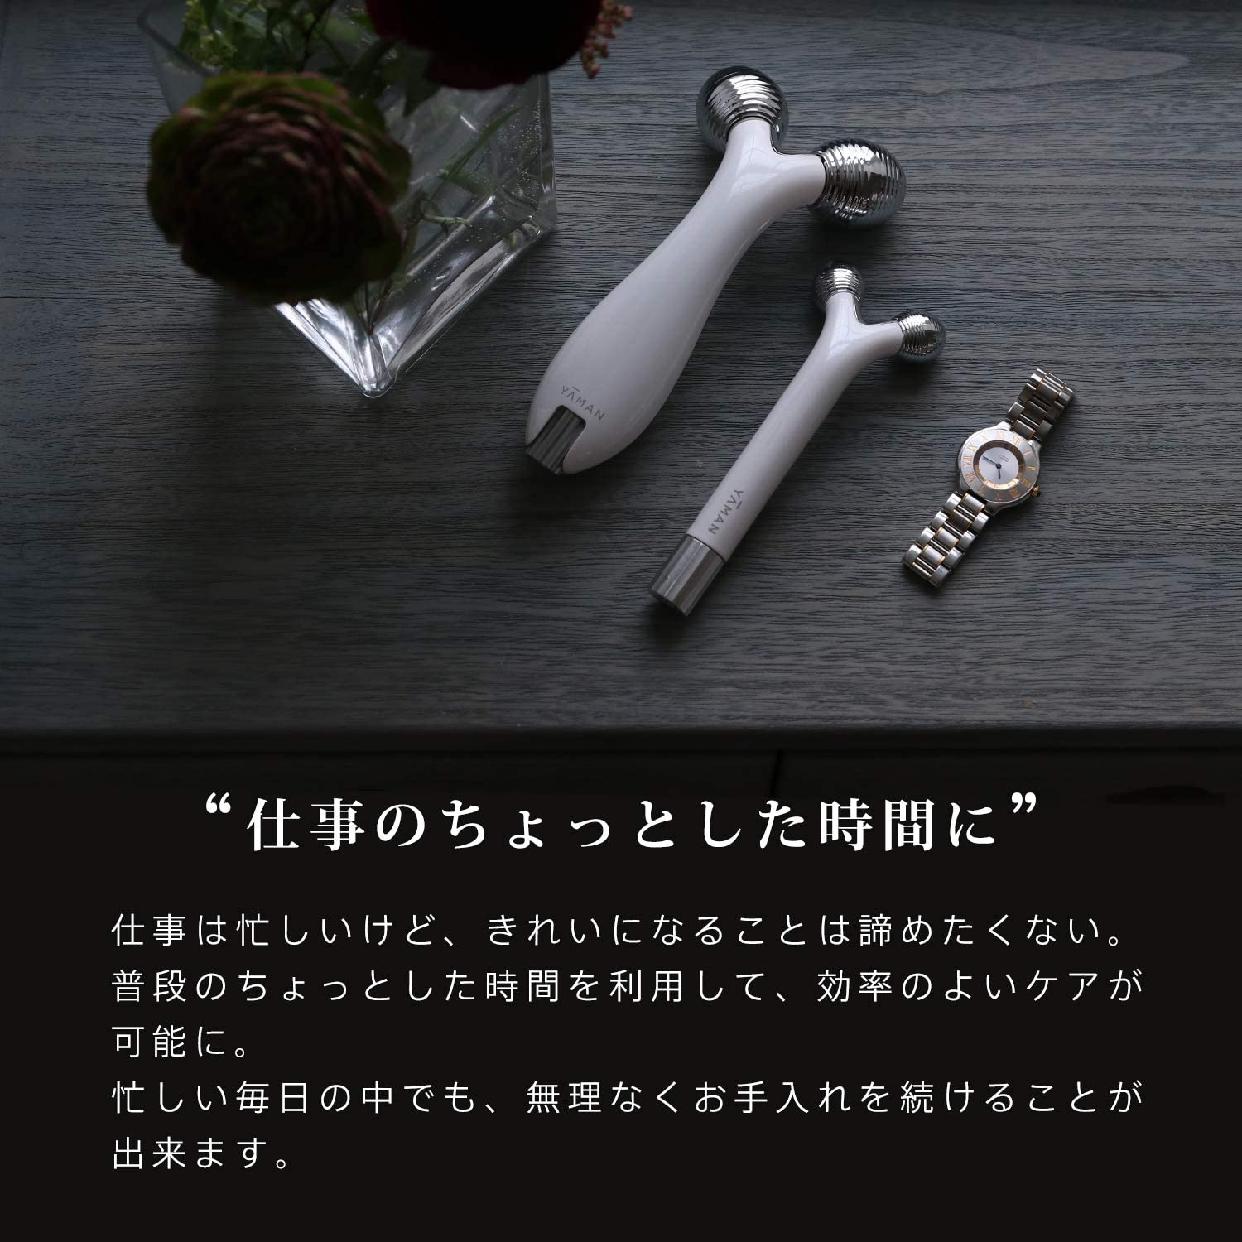 YA-MAN(ヤーマン) WAVY miniの商品画像12